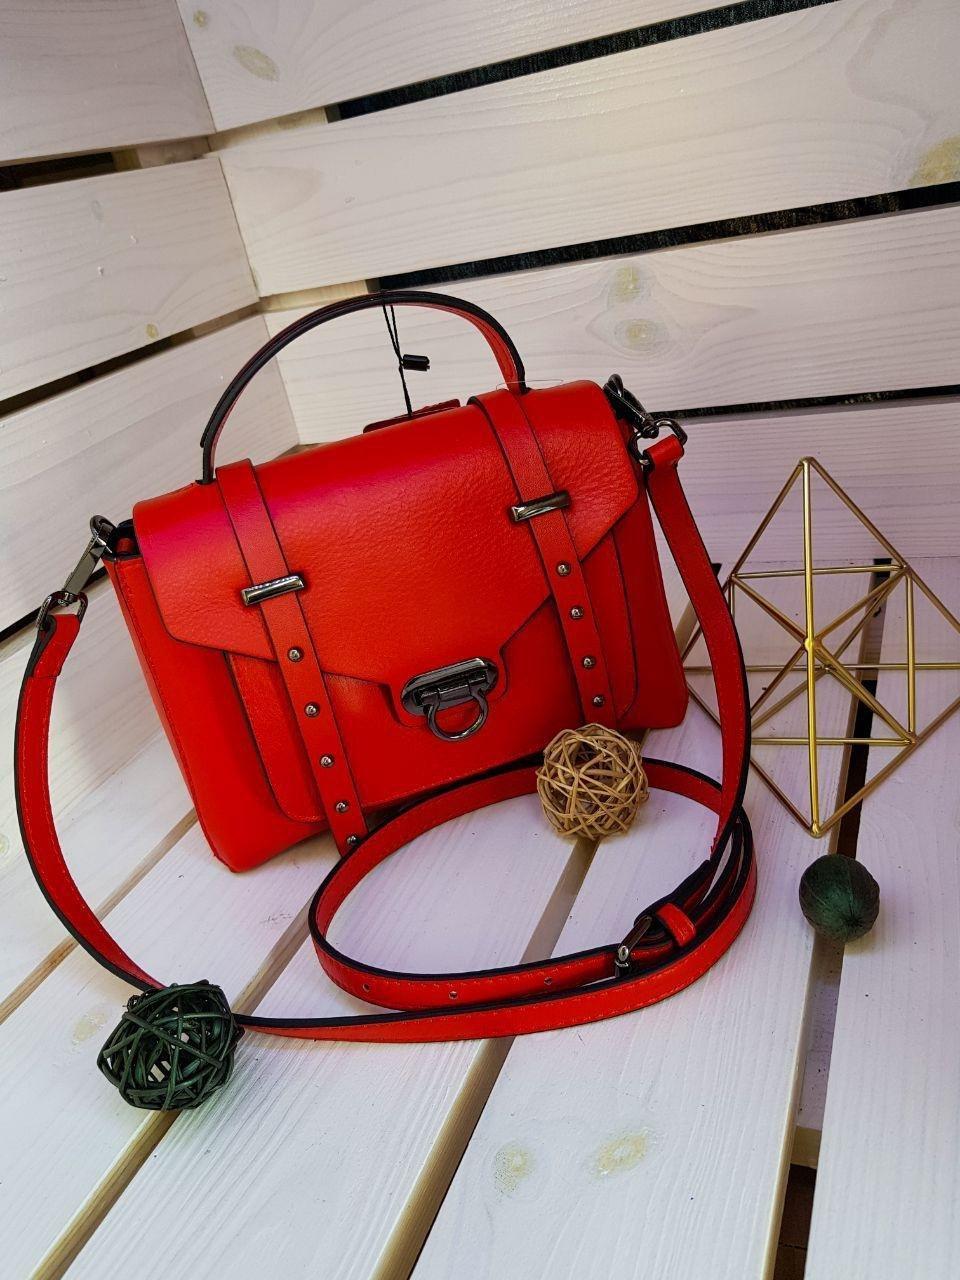 Кожаная женская сумка размером 22х17х10 см Красная